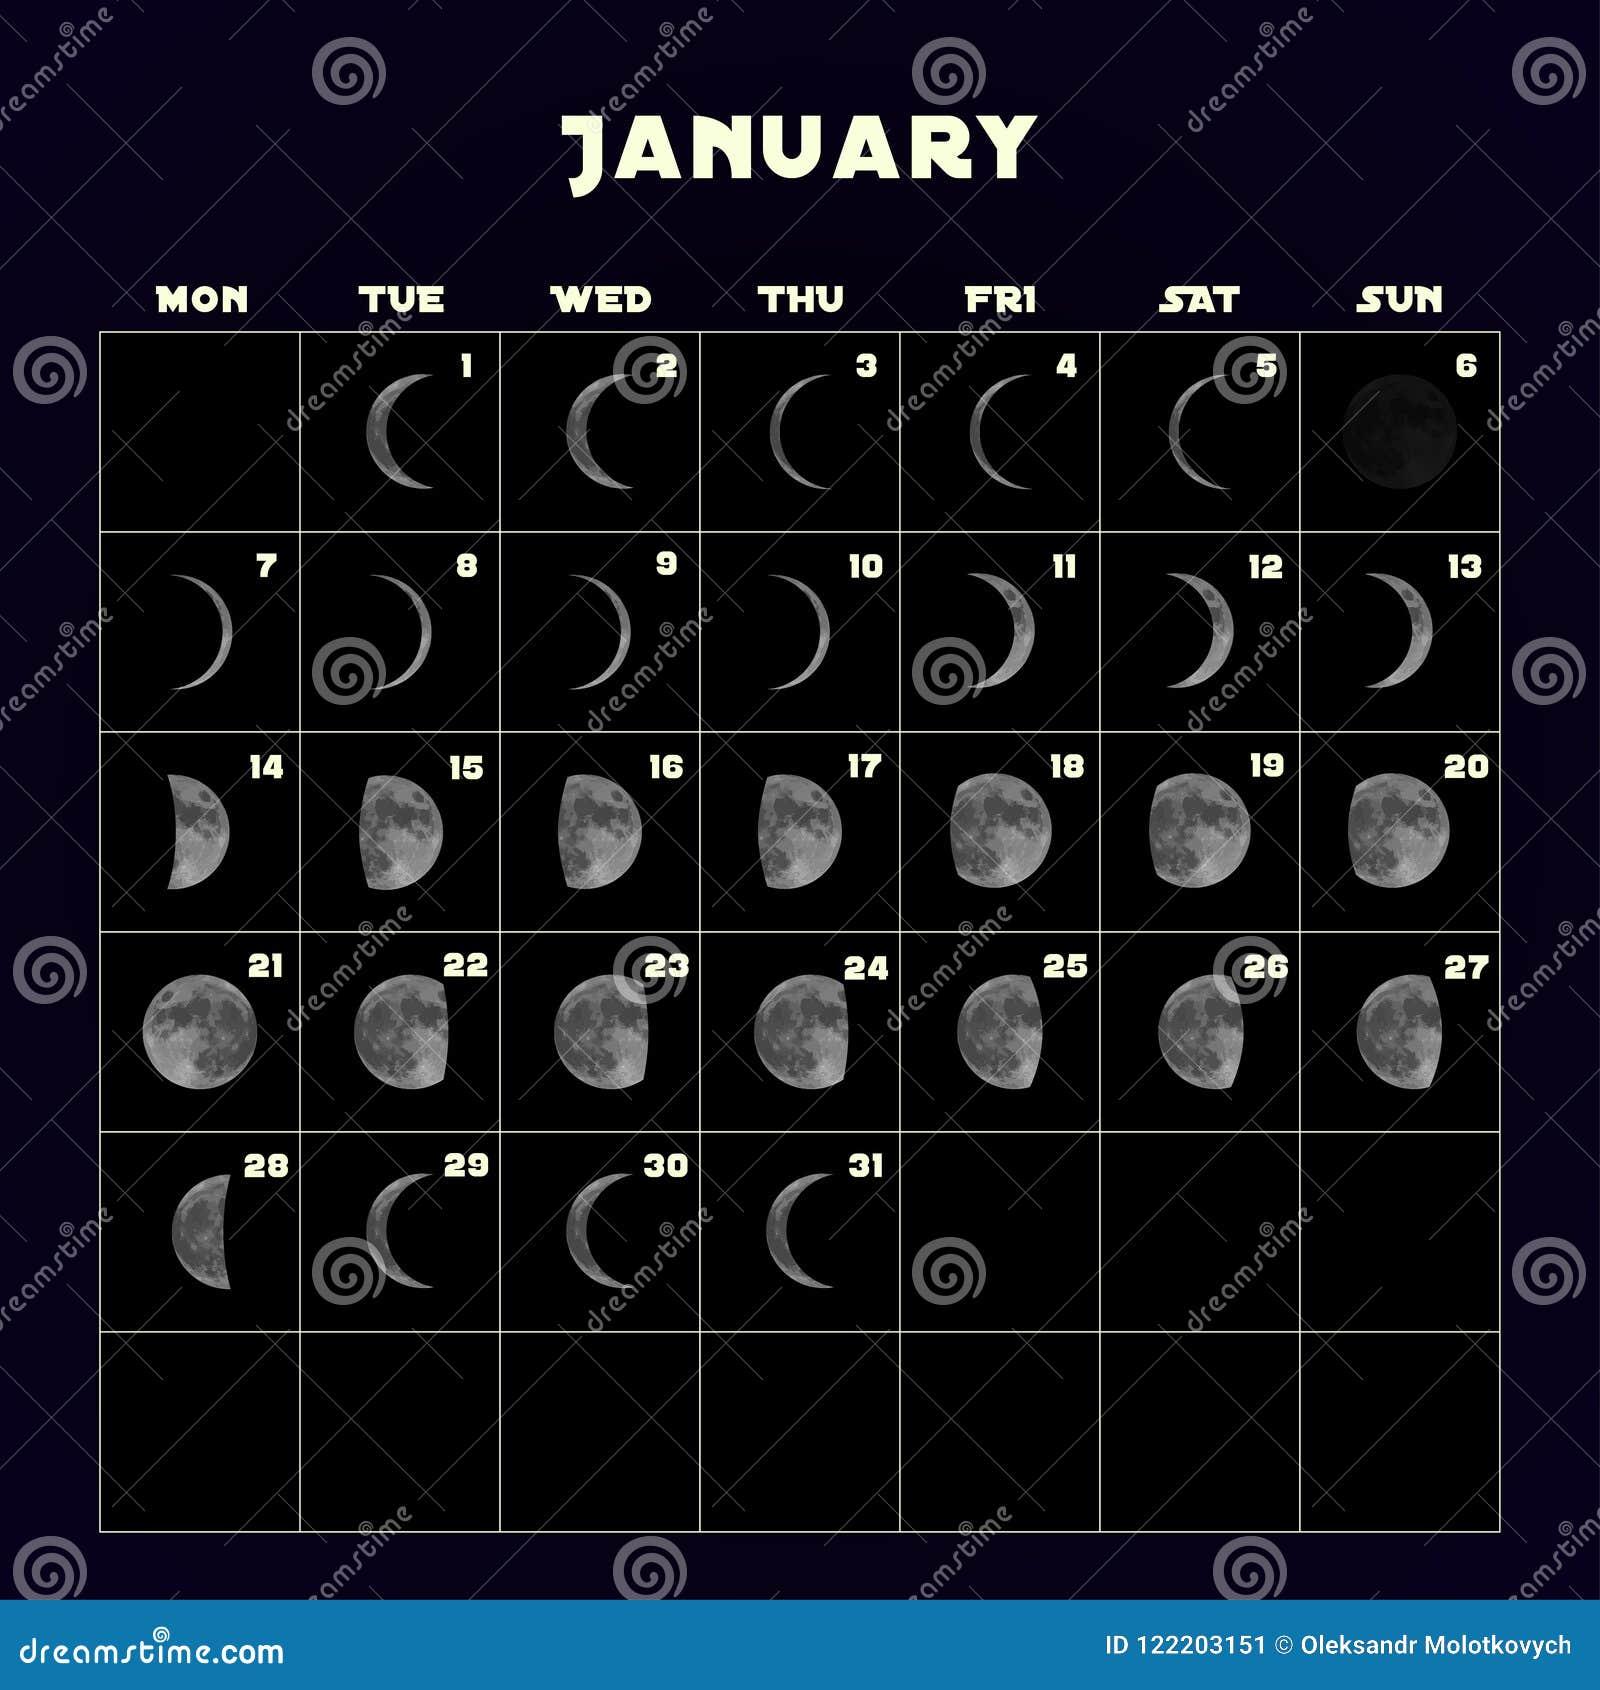 January 2019 Moon Phase Calendar Moon Phases Calendar For 2019 With Realistic Moon. January. Vector